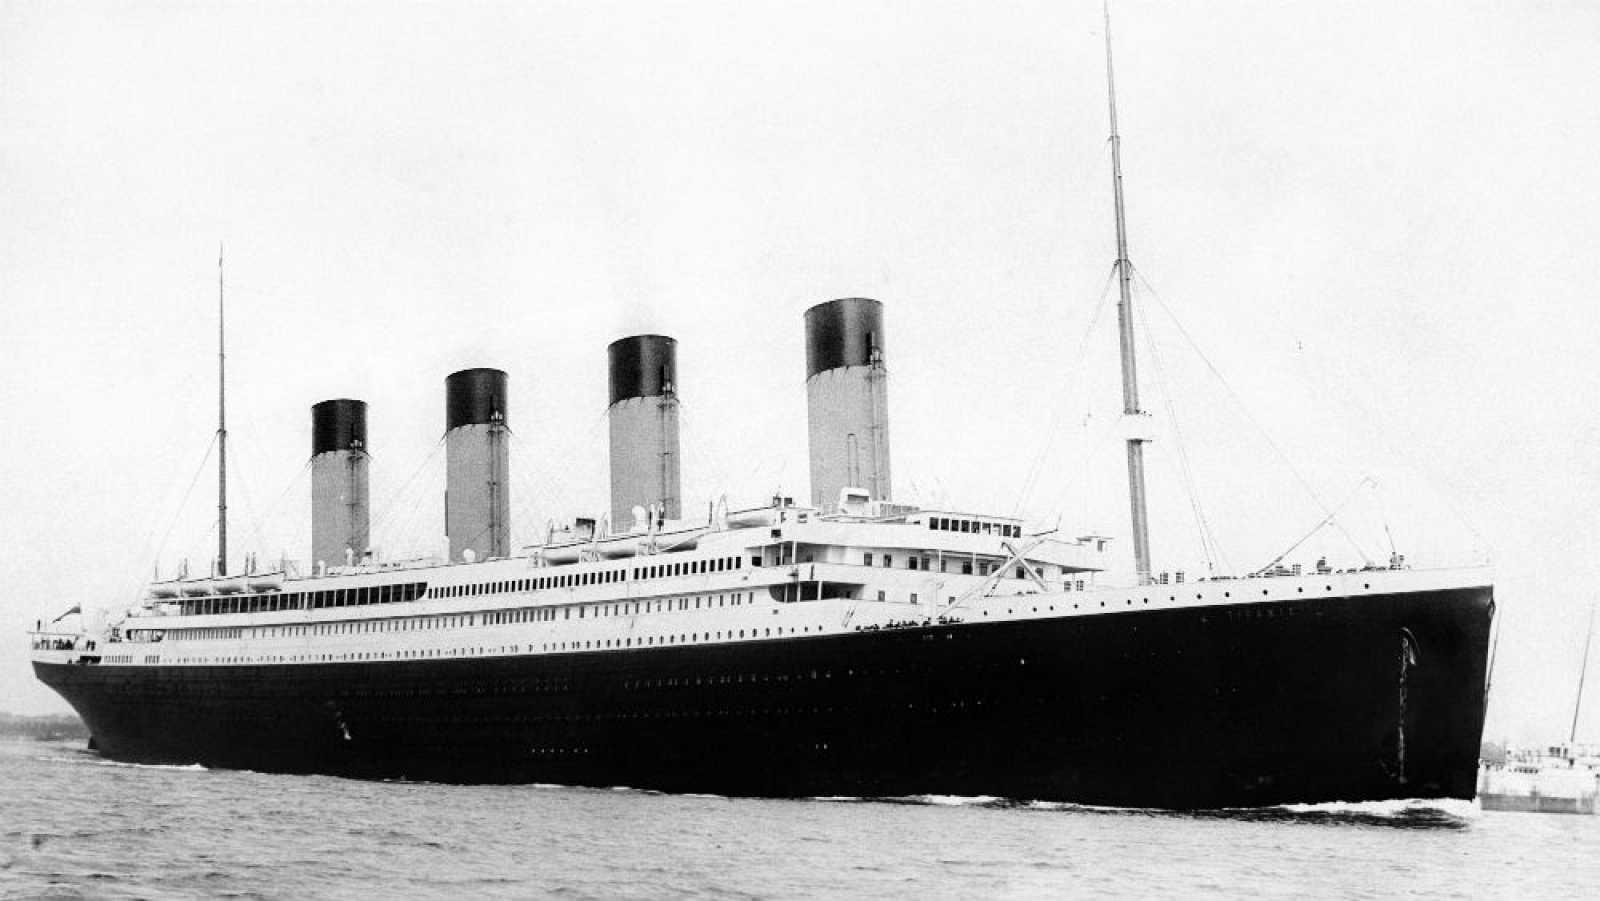 Documentos RNE - Un siglo del Titanic: del drama a la épica - 14/04/12 - escuchar ahora